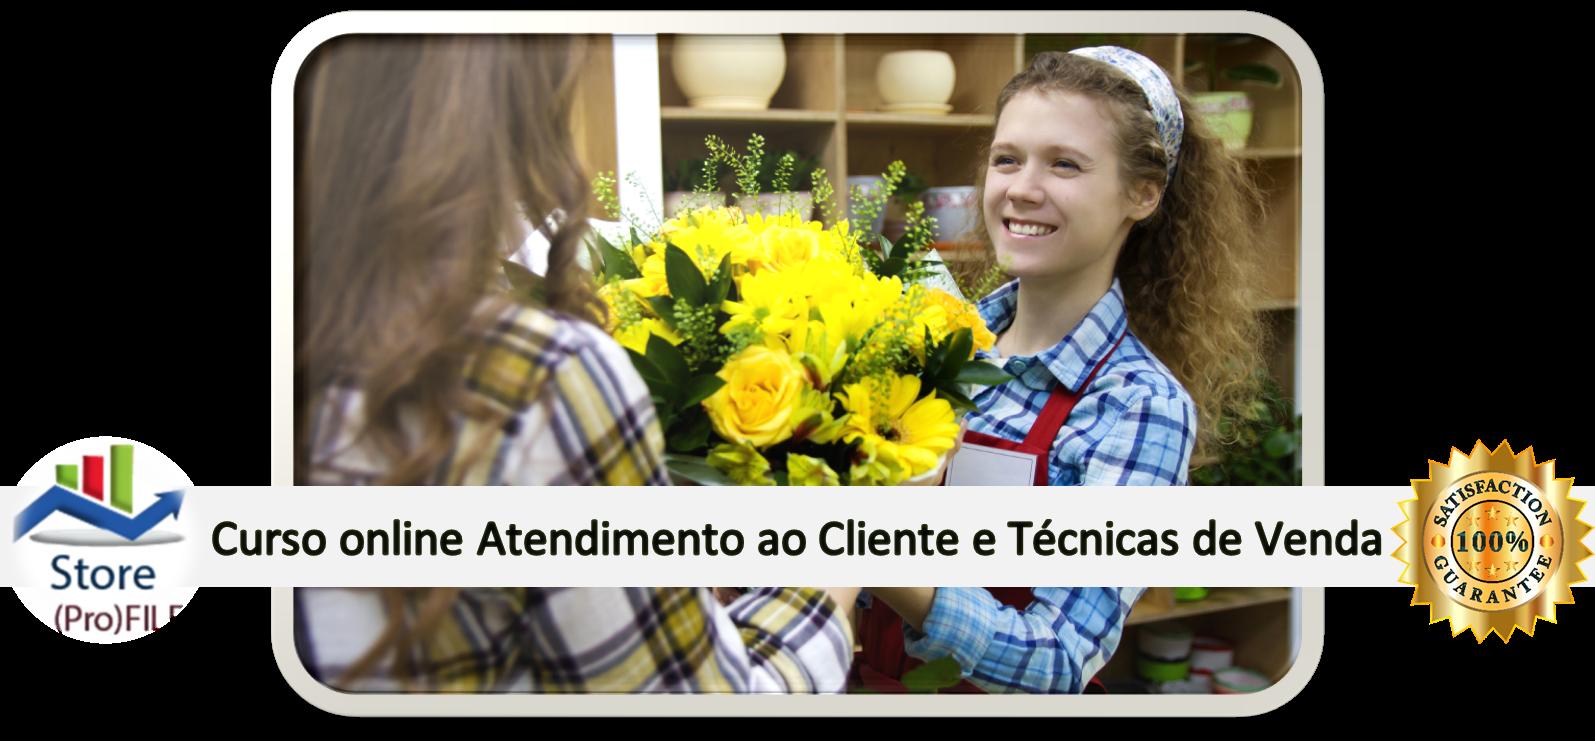 Curso Atendimento ao Cliente e Técnicas de Venda